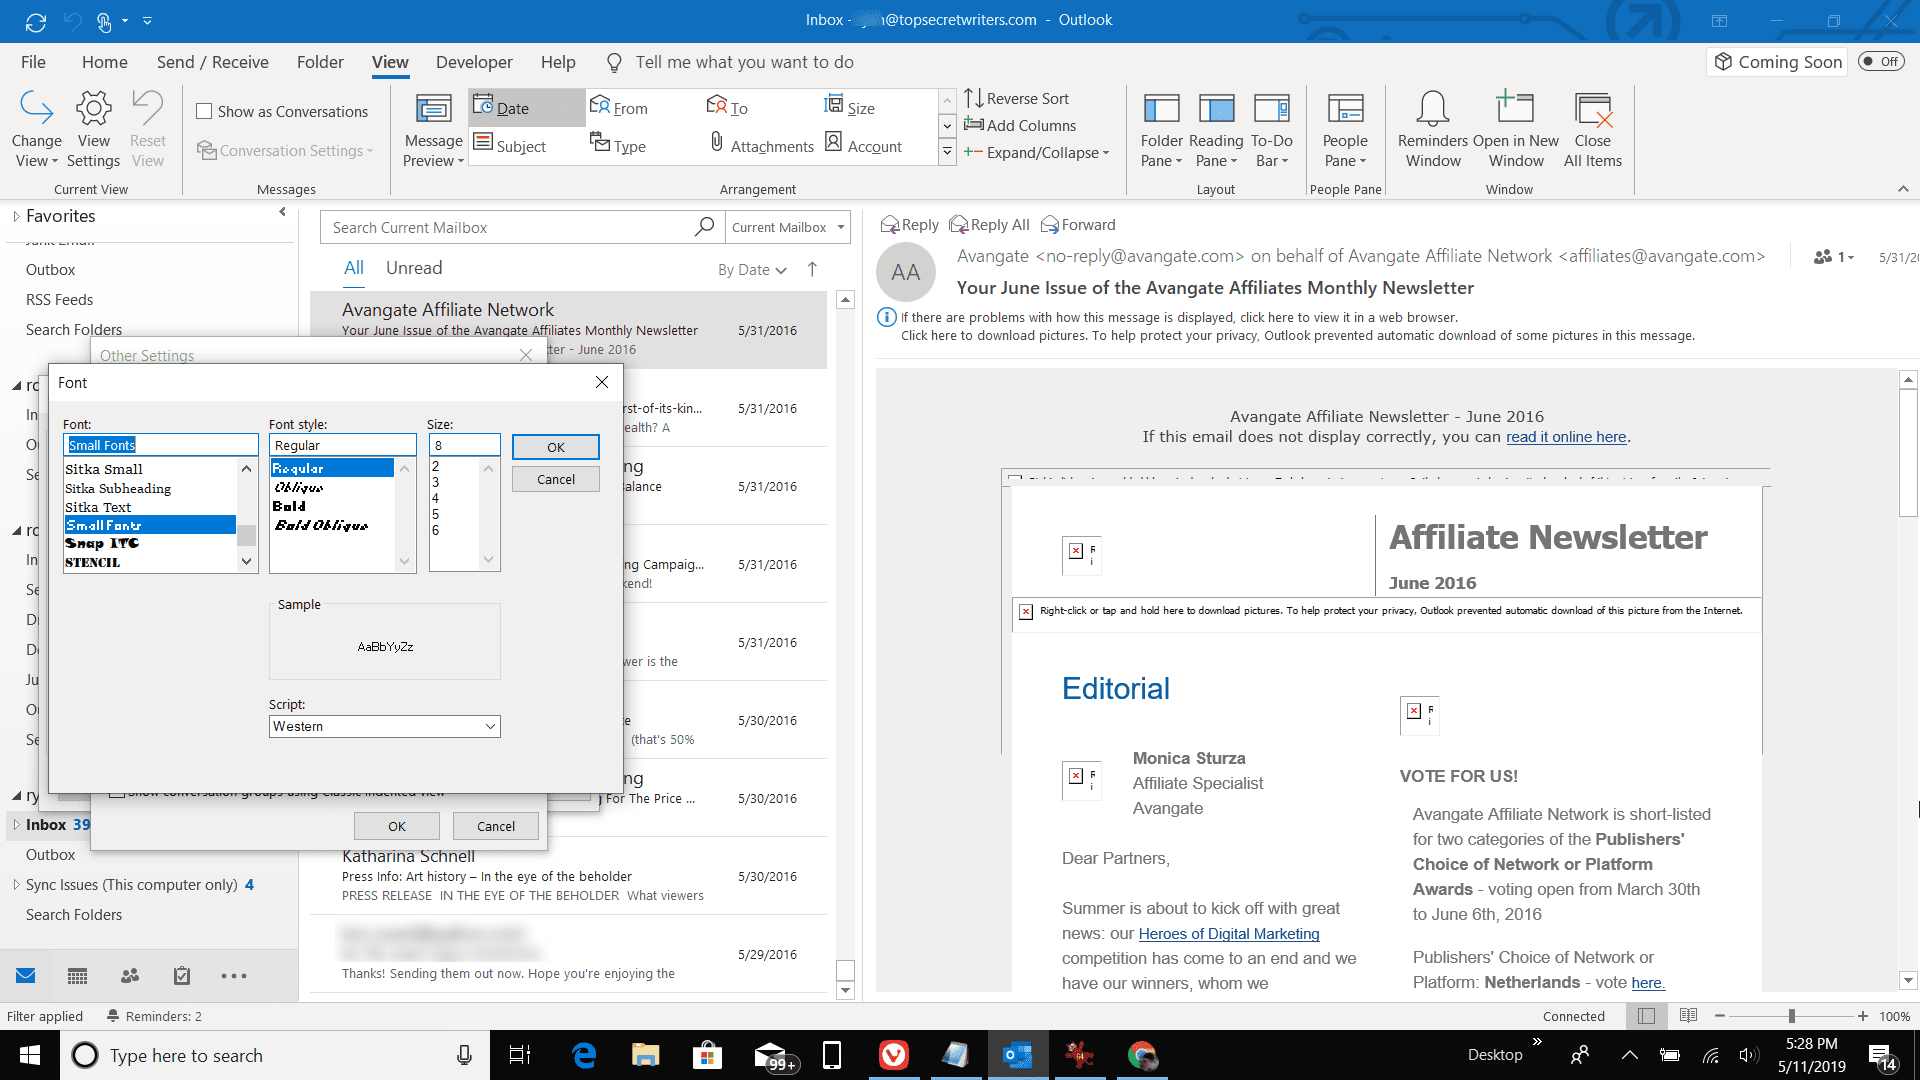 Screenshot of font settings in Outlook